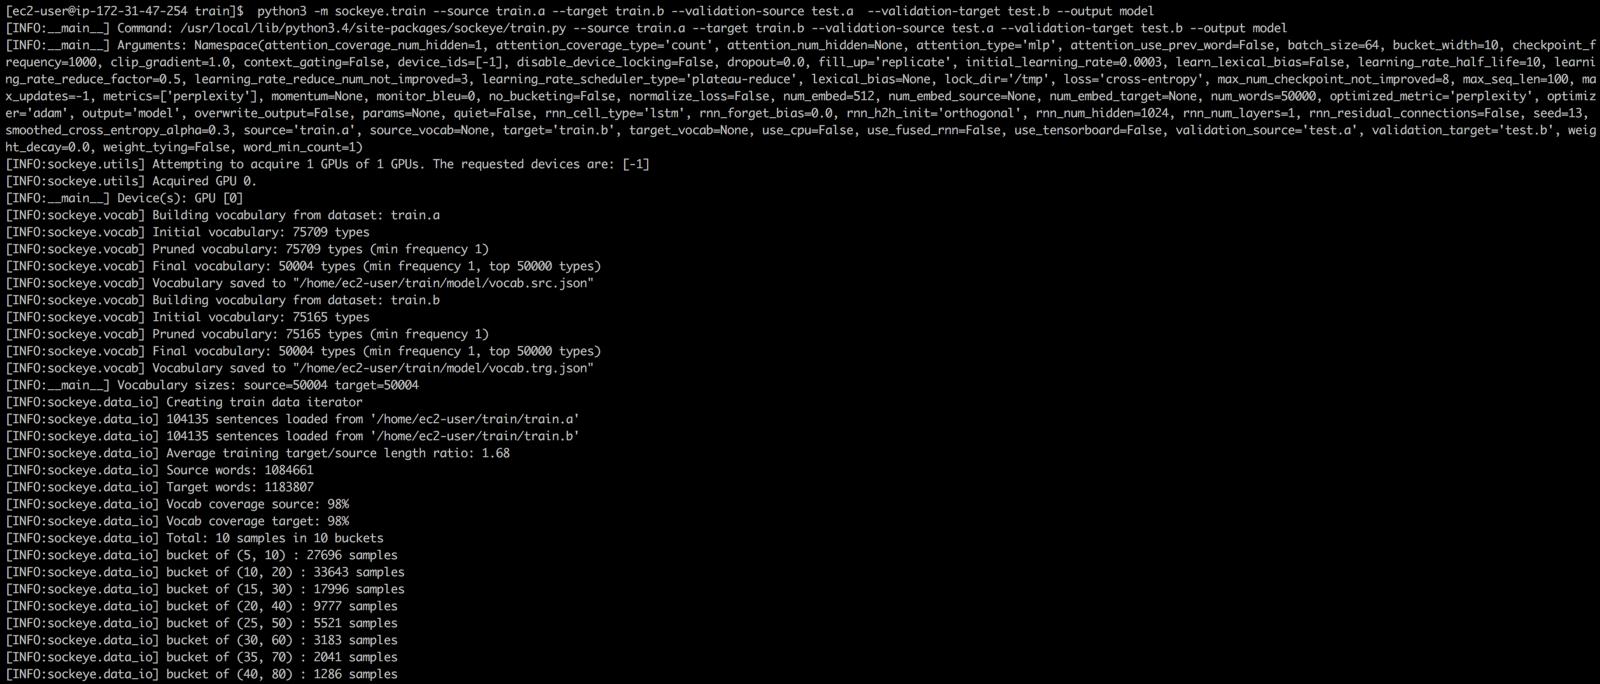 Создание chatbot-a с помощью sockeye (MXNet) на базе AWS EC2 и AWS DeepLearning AMI - 11